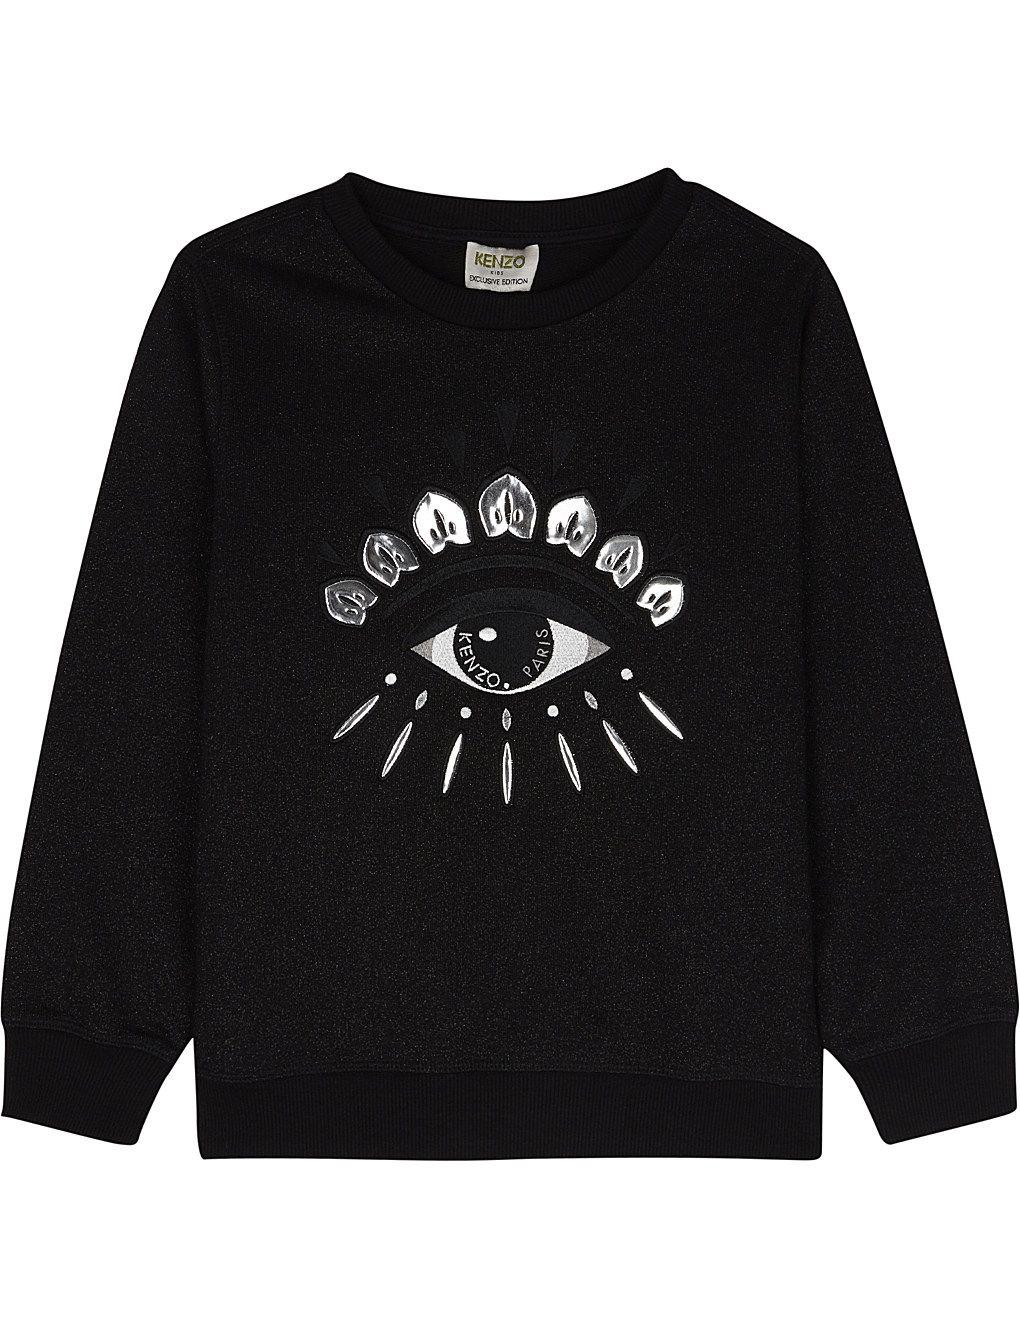 16cede7b kenzo sweatshirt 16 years sale > OFF66% Discounts